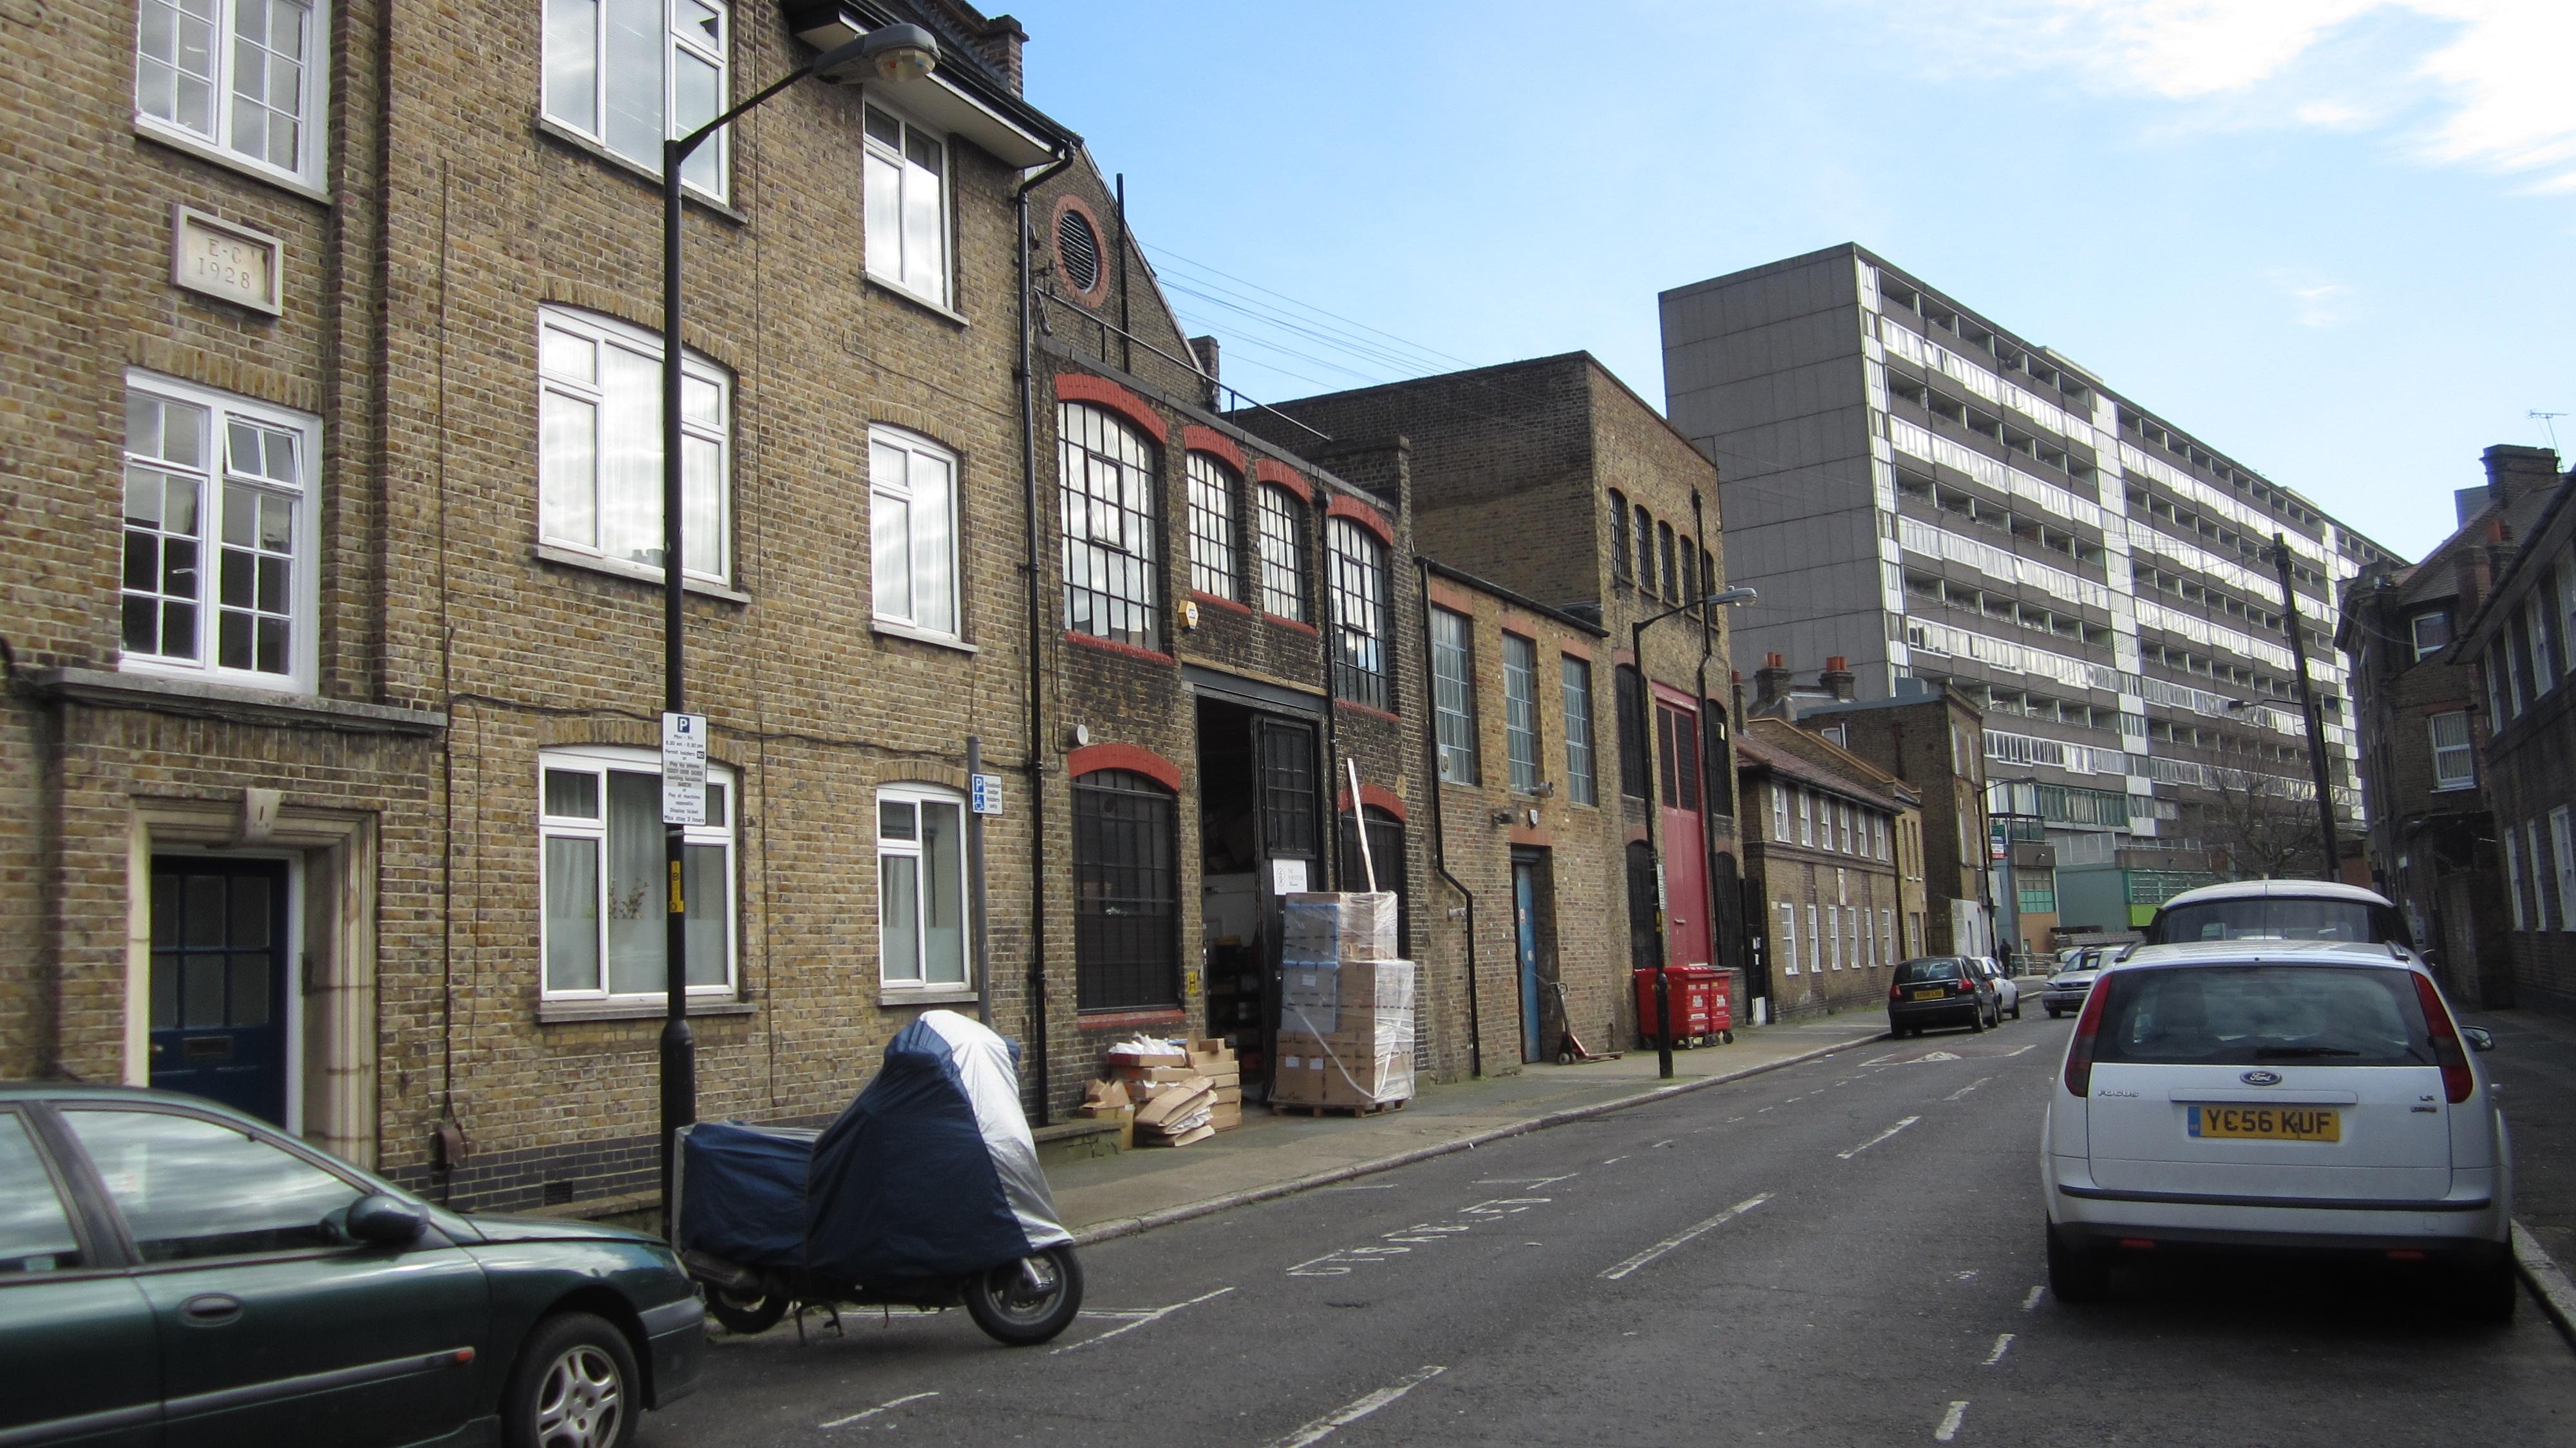 File:Horsley Street Walworth.jpg - Wikipedia